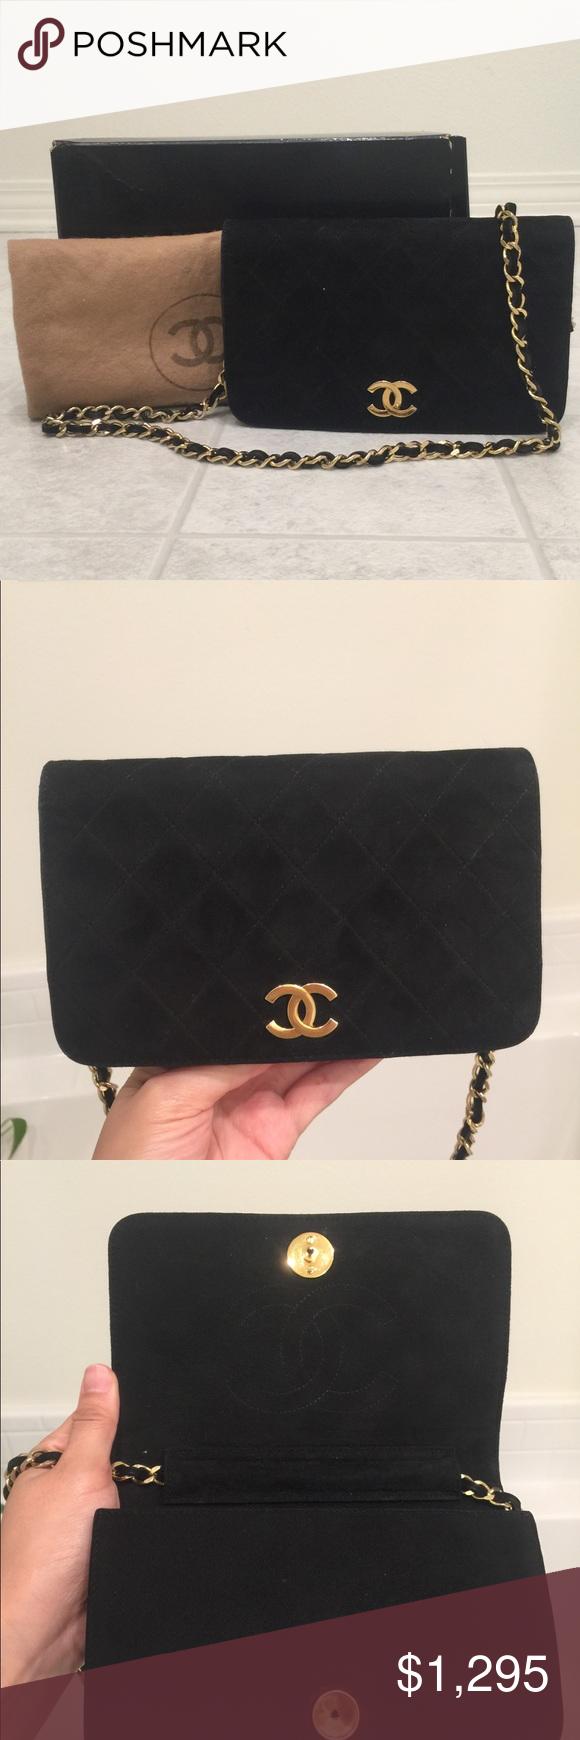 Chanel vintage suede mini flap shoulder bag Size W 7.48